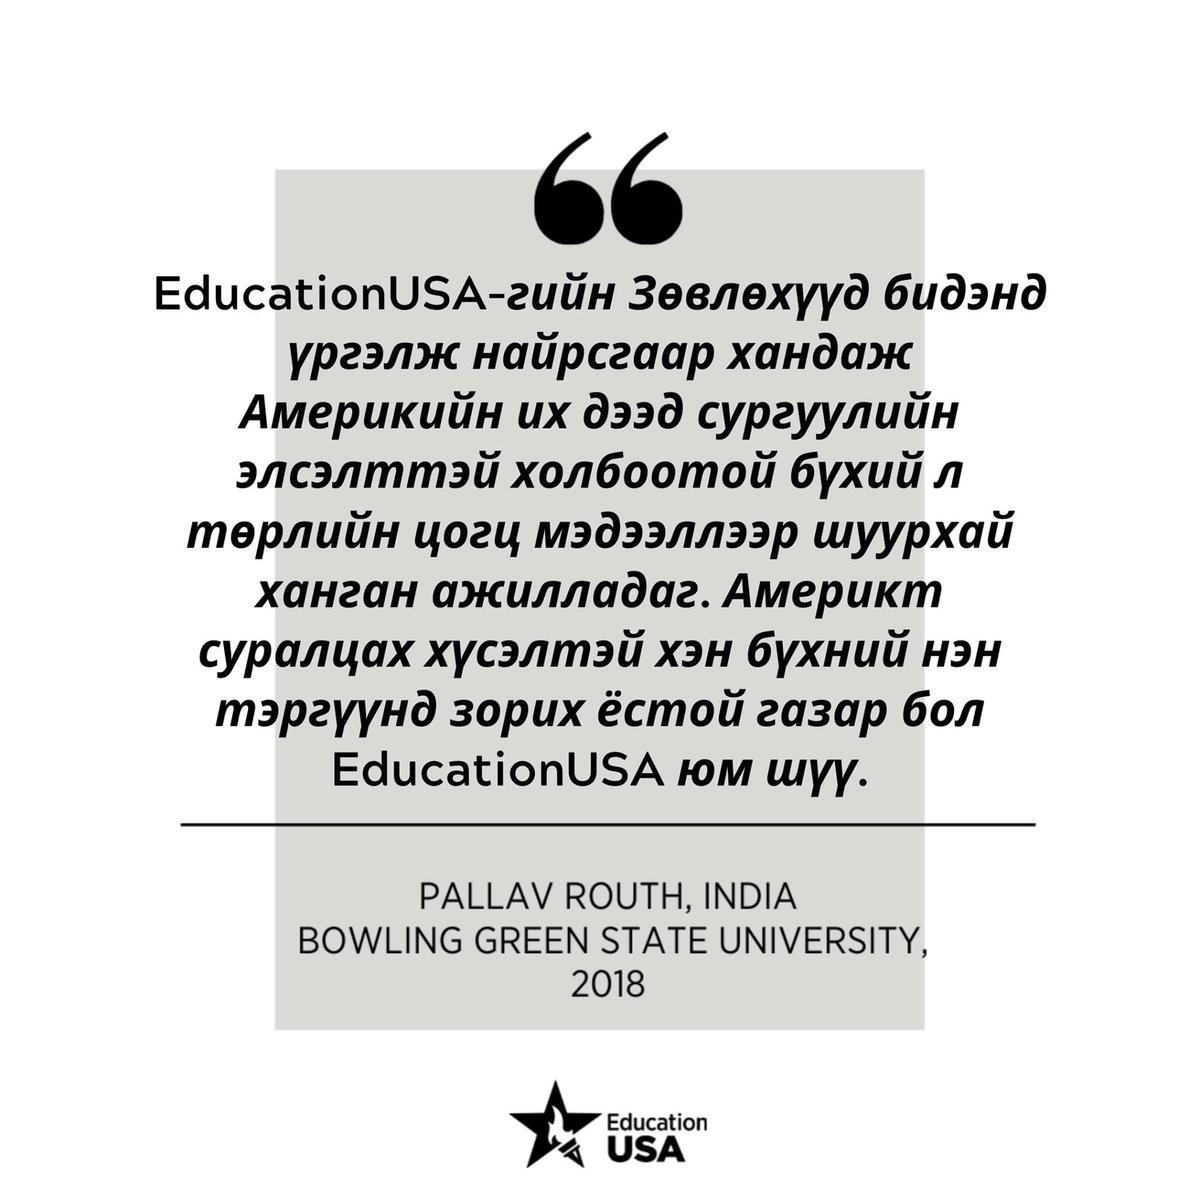 #WednesdayWisdom хаштагийг ашиглан EducationUSA Mongolia-гаас шинээр сурч, мэдэж авсан зүйлсээ хуваалцаарай!🥰  #WhyEducationUSA #StudentSuccess #StudentStories https://t.co/cmJR9NhNqQ